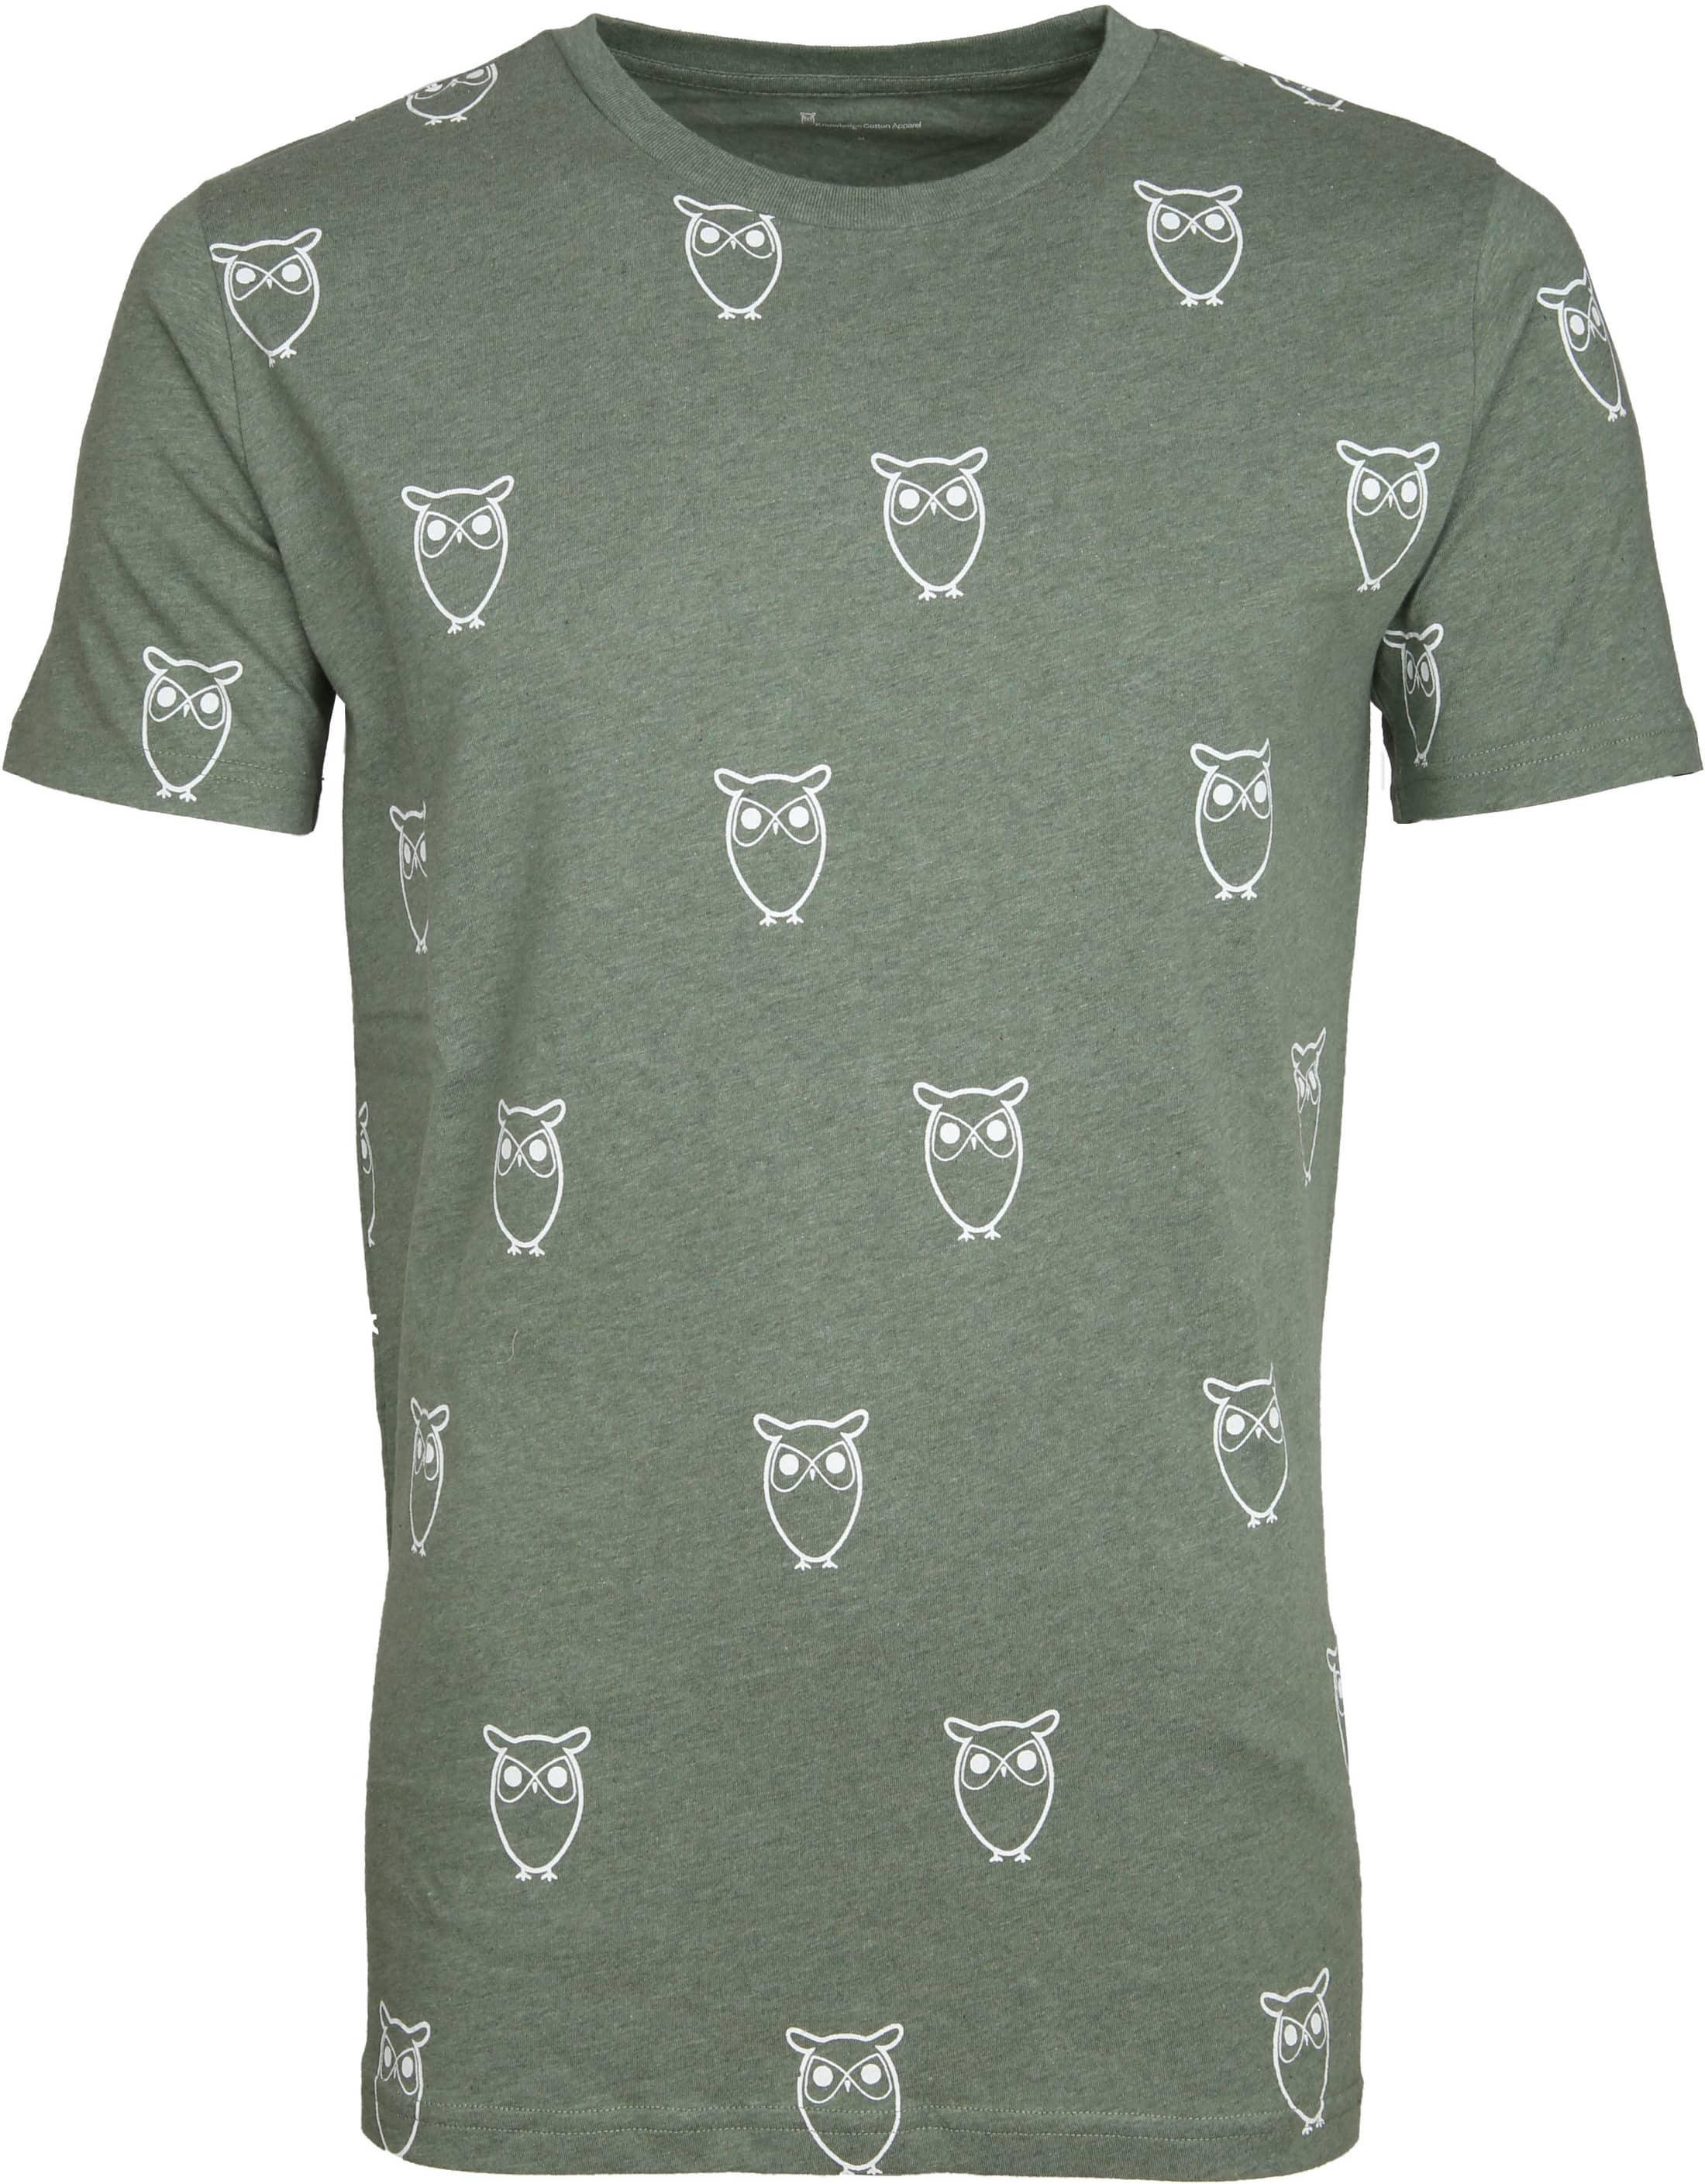 Knowledge Cotton Apparel T-shirt Owl Green foto 0